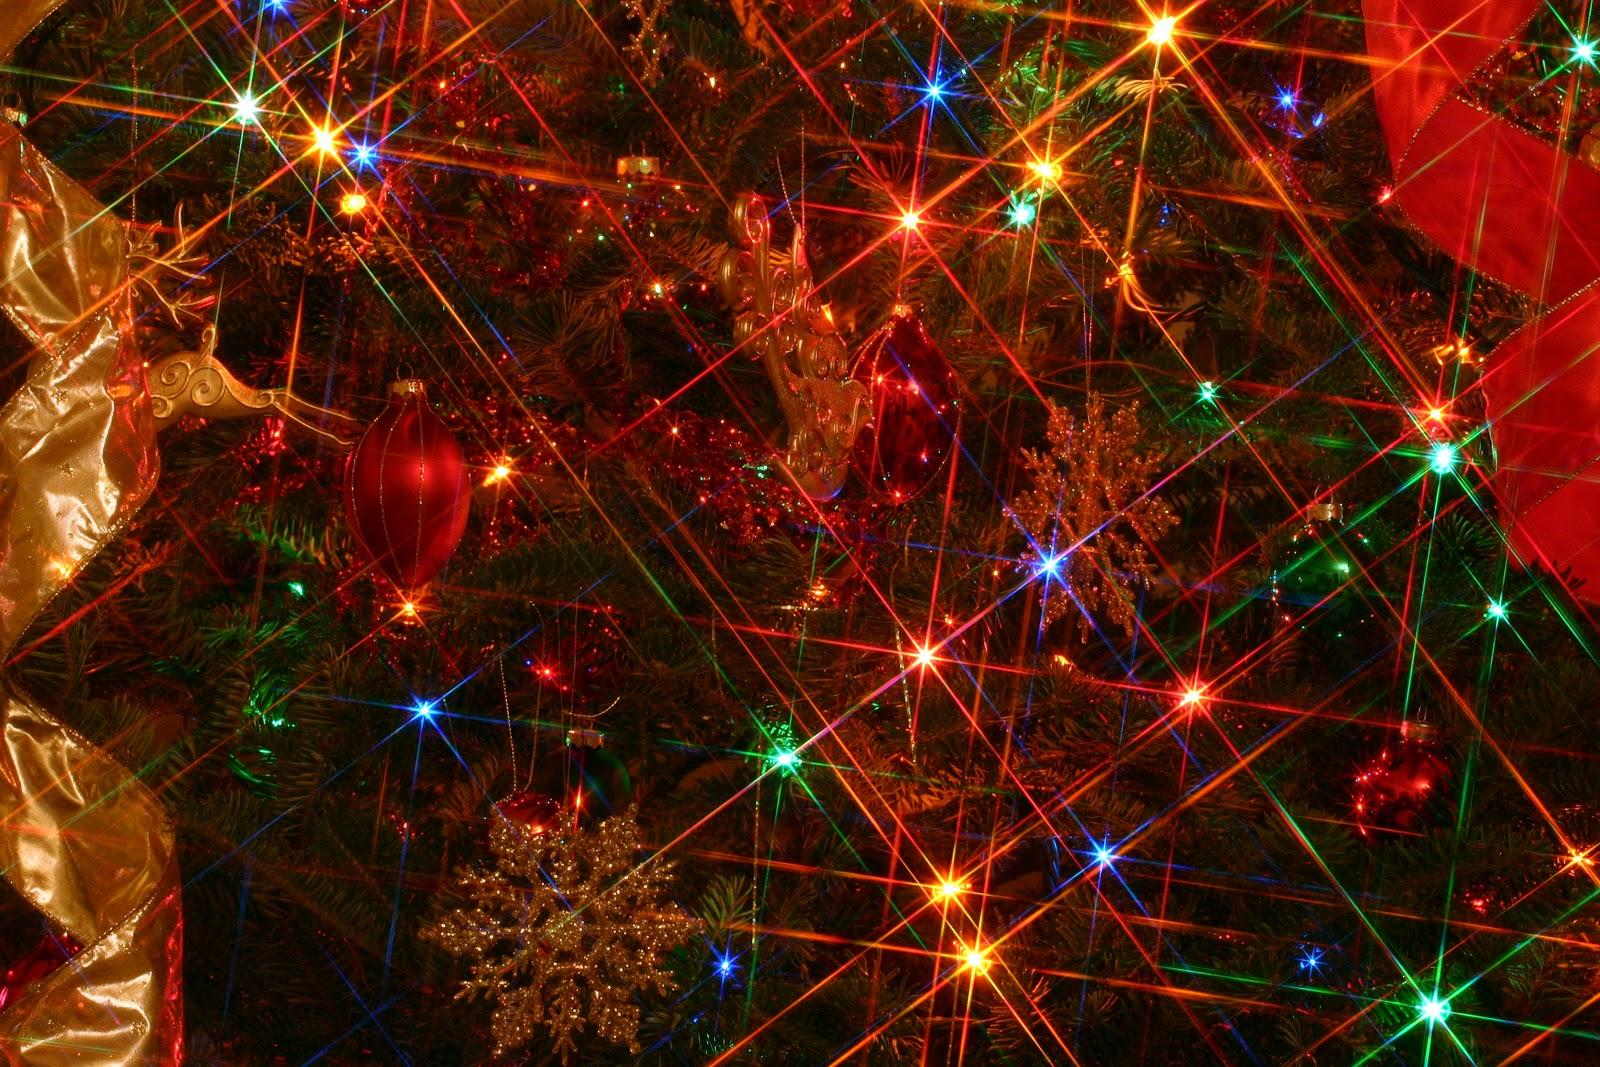 Christmas Lights Backgrounds Group 58